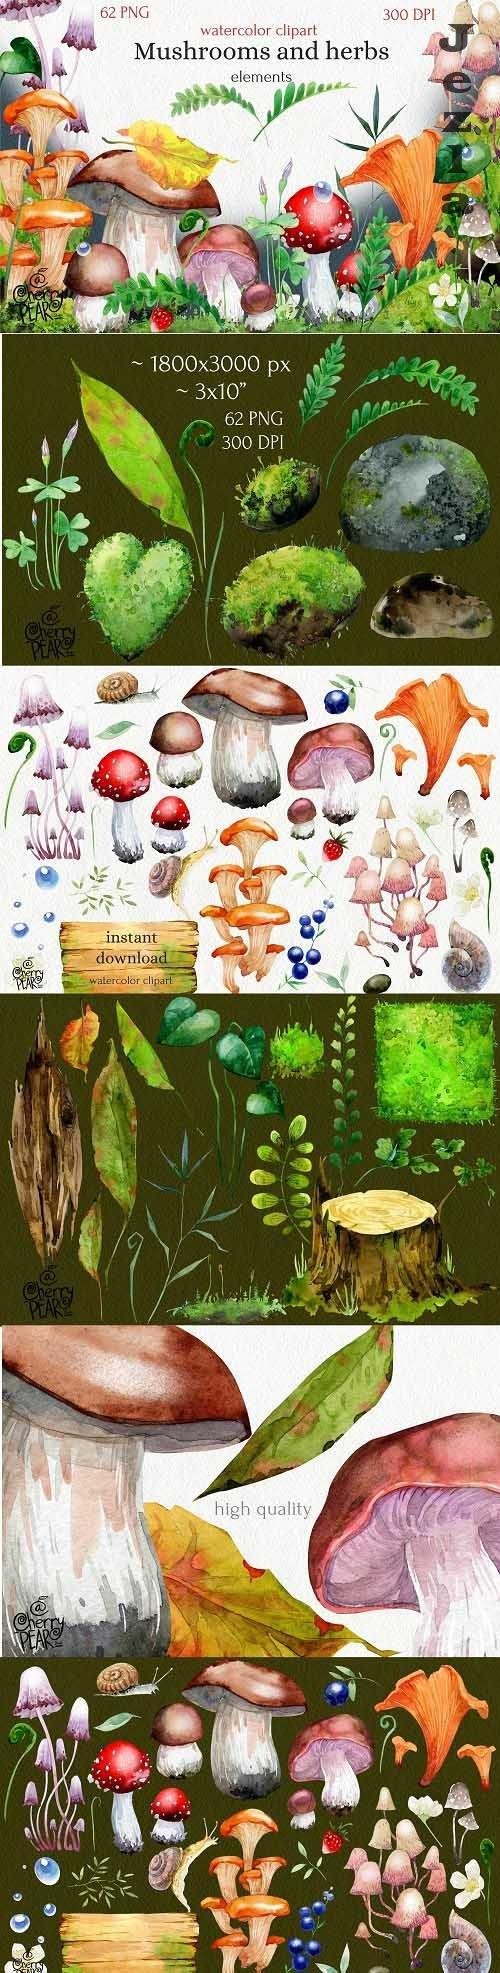 Watercolor cliparts of mushrooms and herbs, individual PNG - 1473824